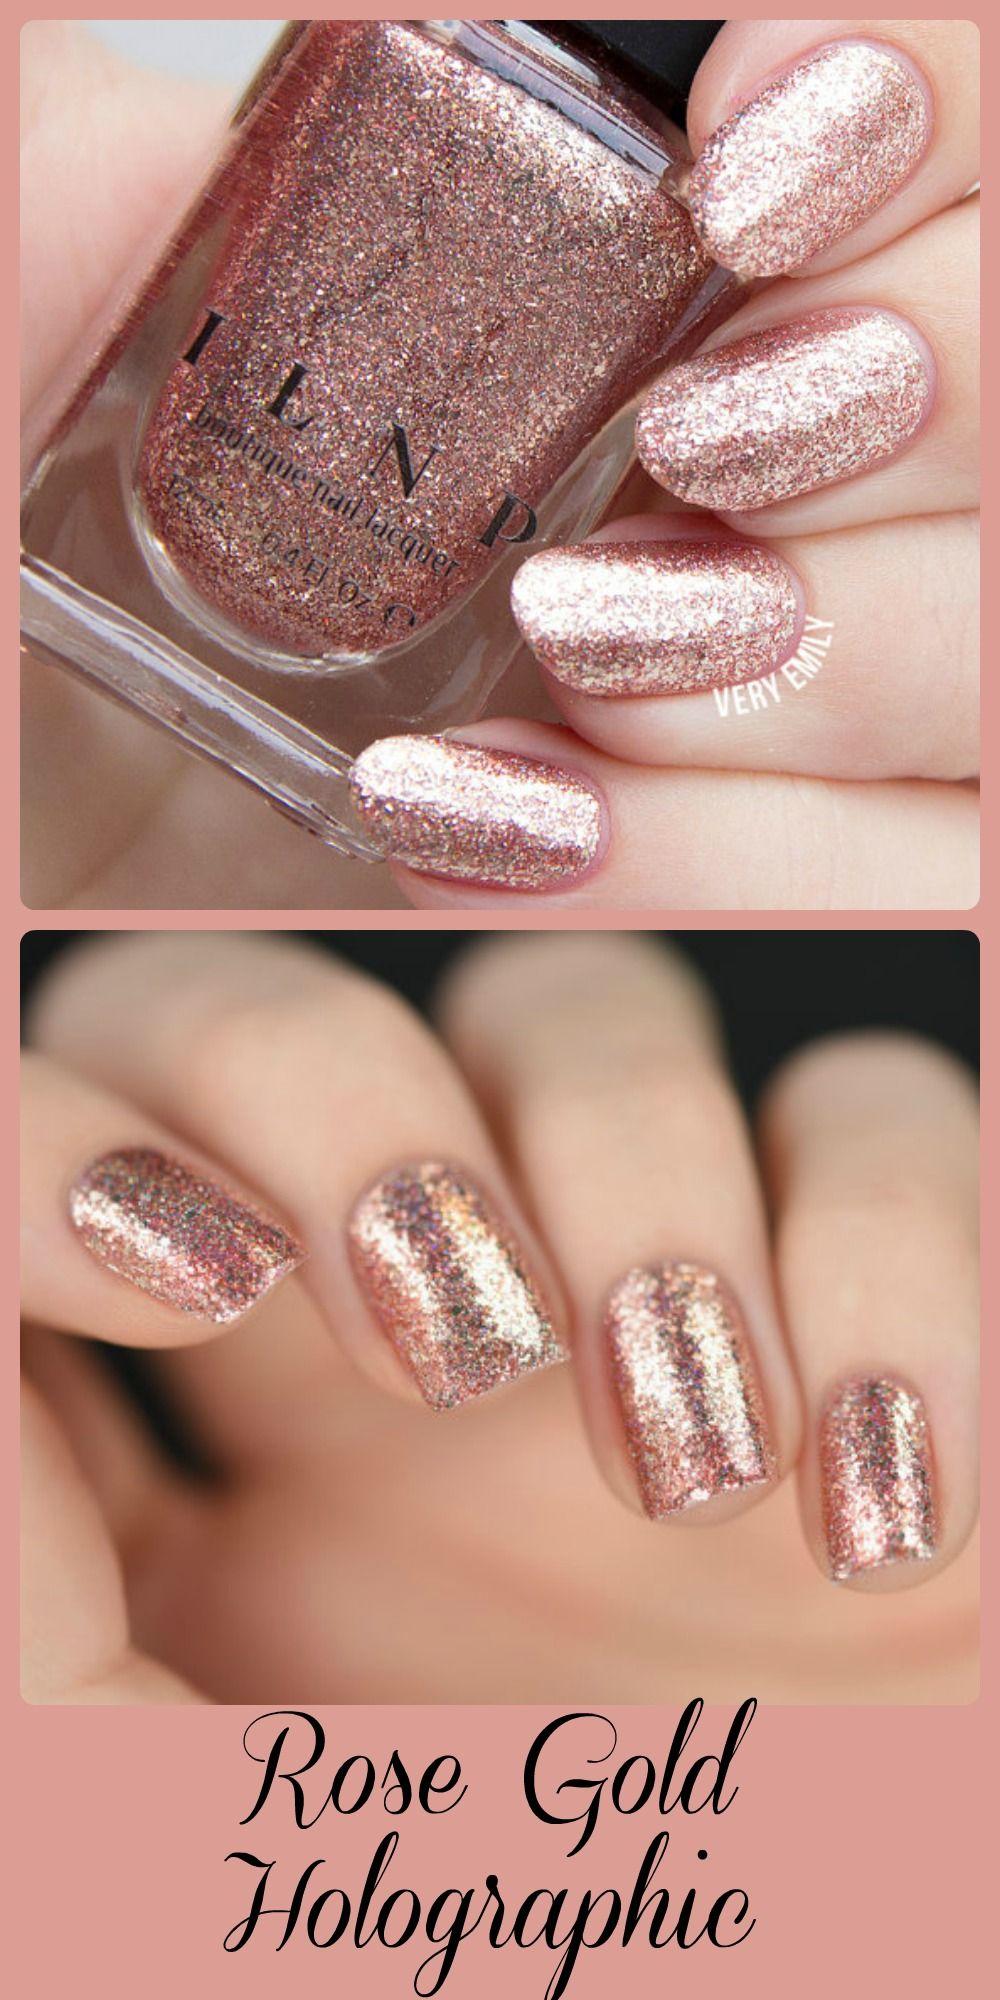 Juliette - Rose Gold Holographic Nail Polish #ad #nailpolish ...